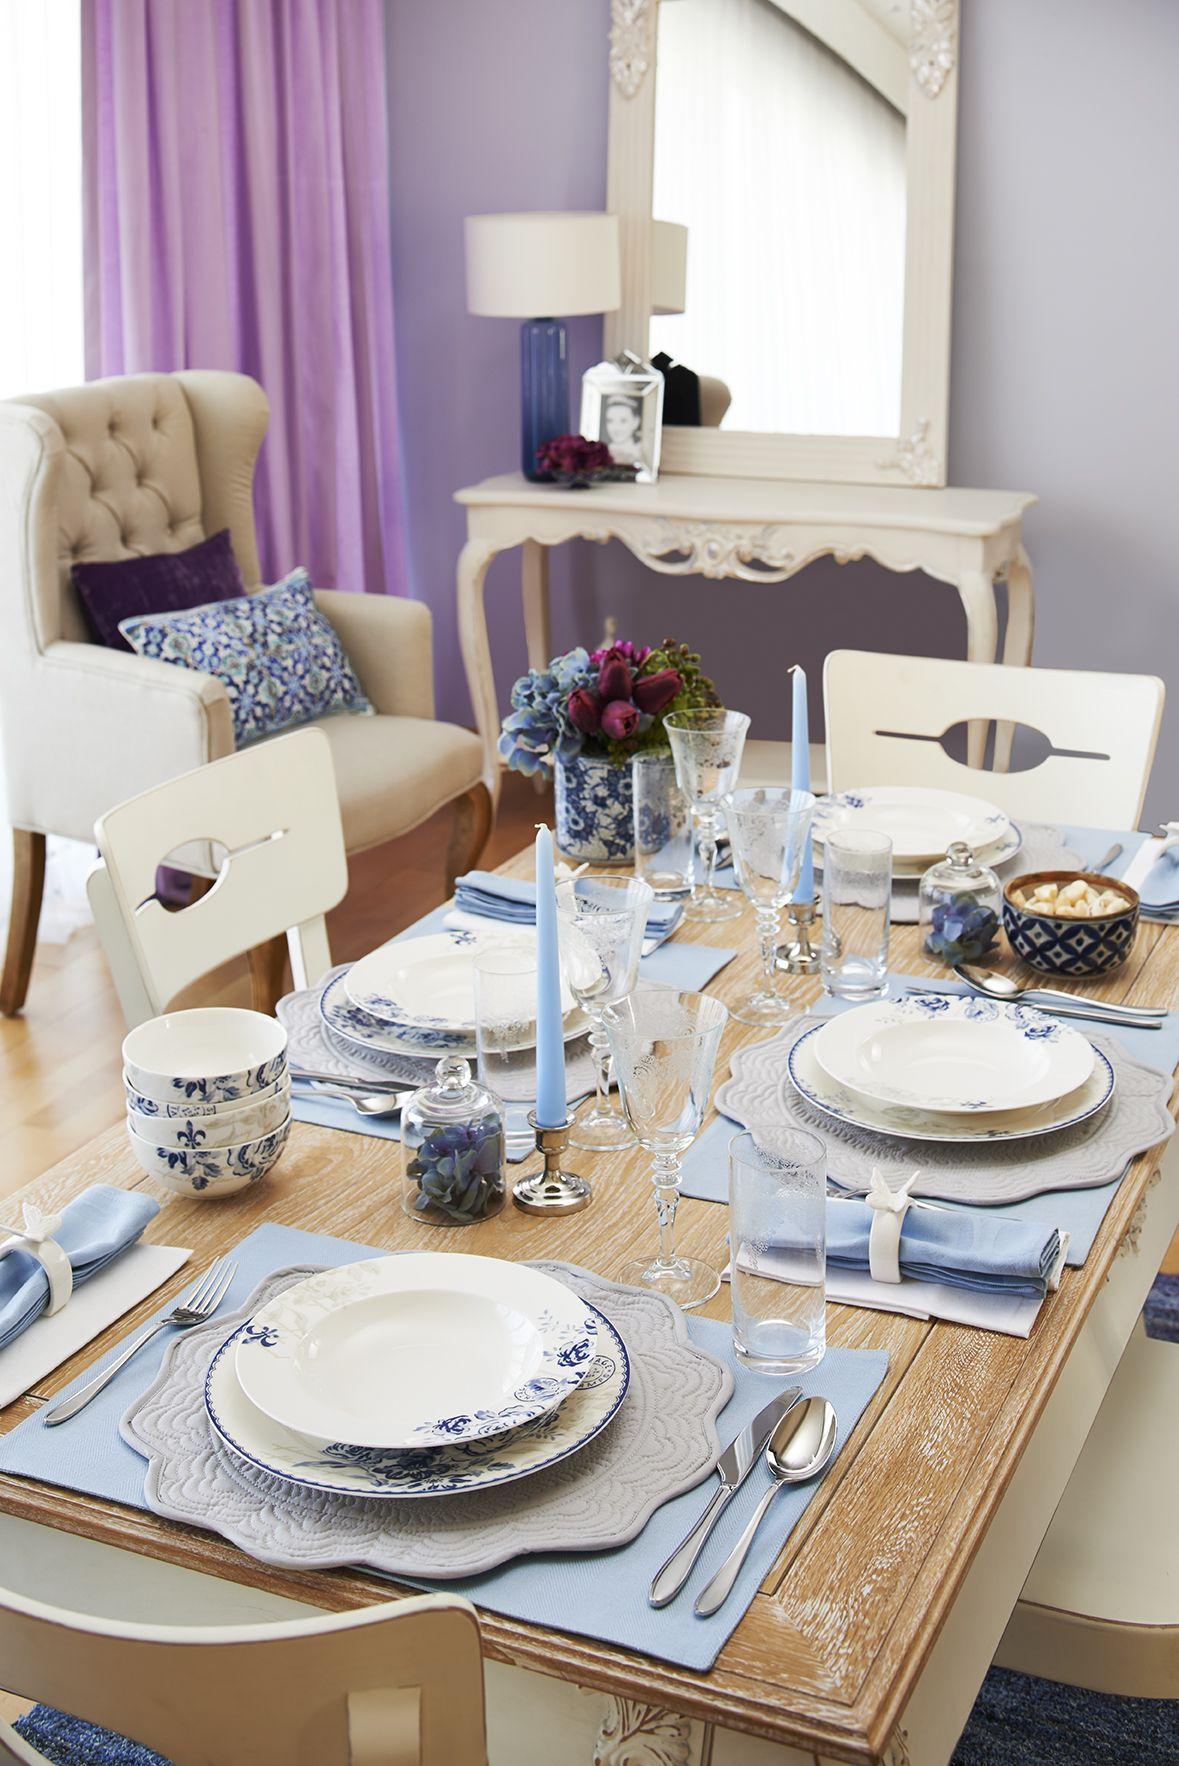 Vintage Blue yemek takımı / Vintage Blue dinnerware set #bernardo ...